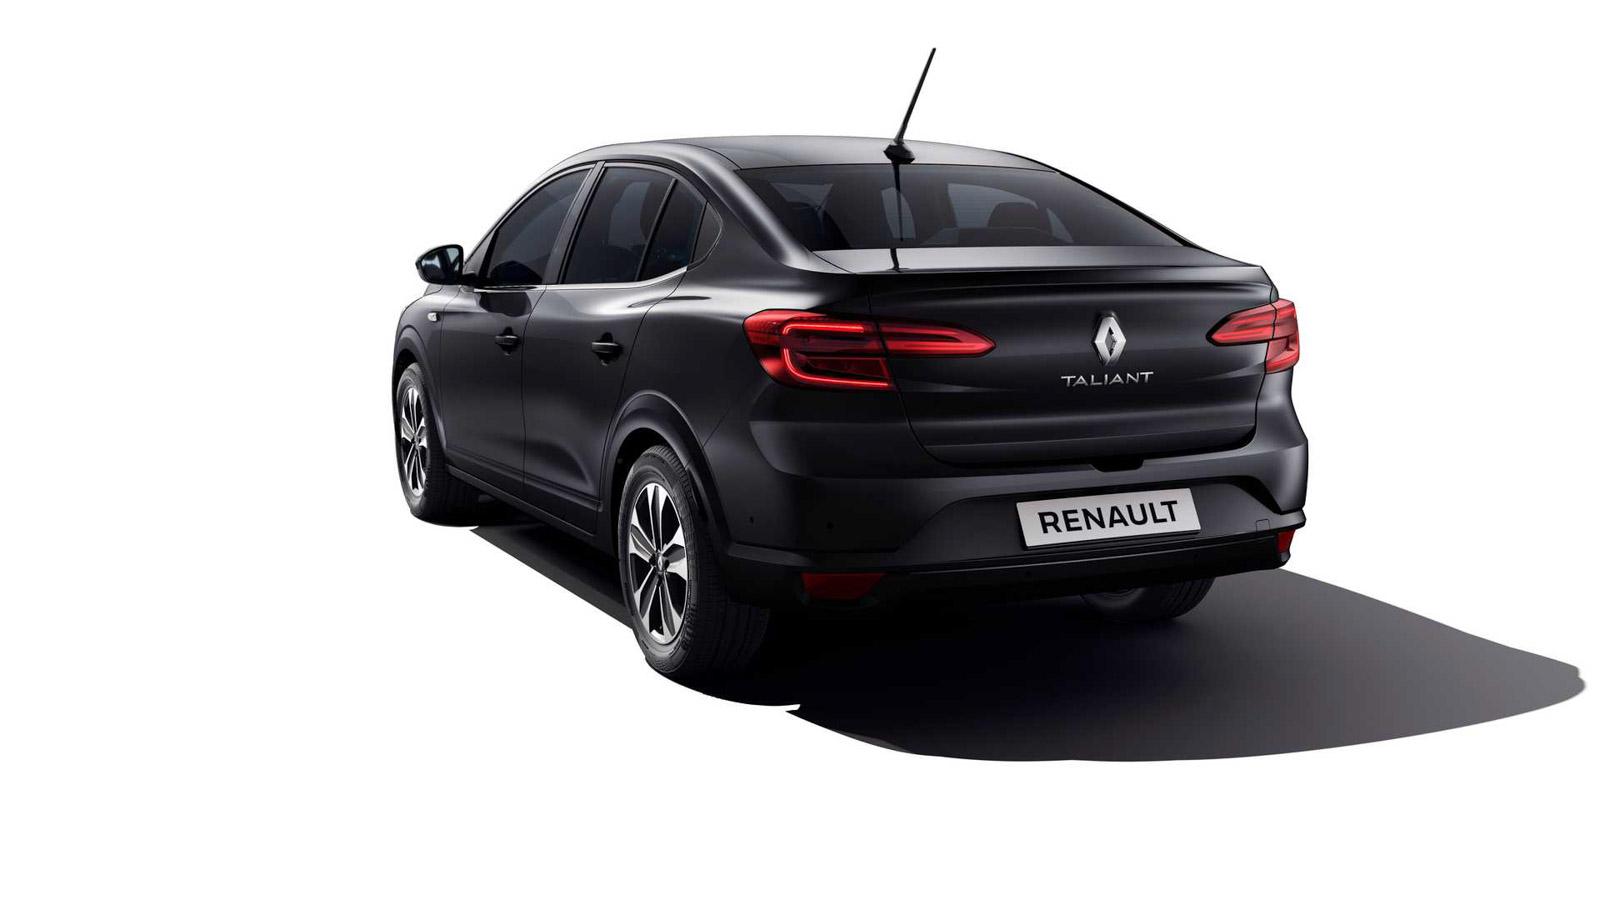 Lado del Renault Taliant